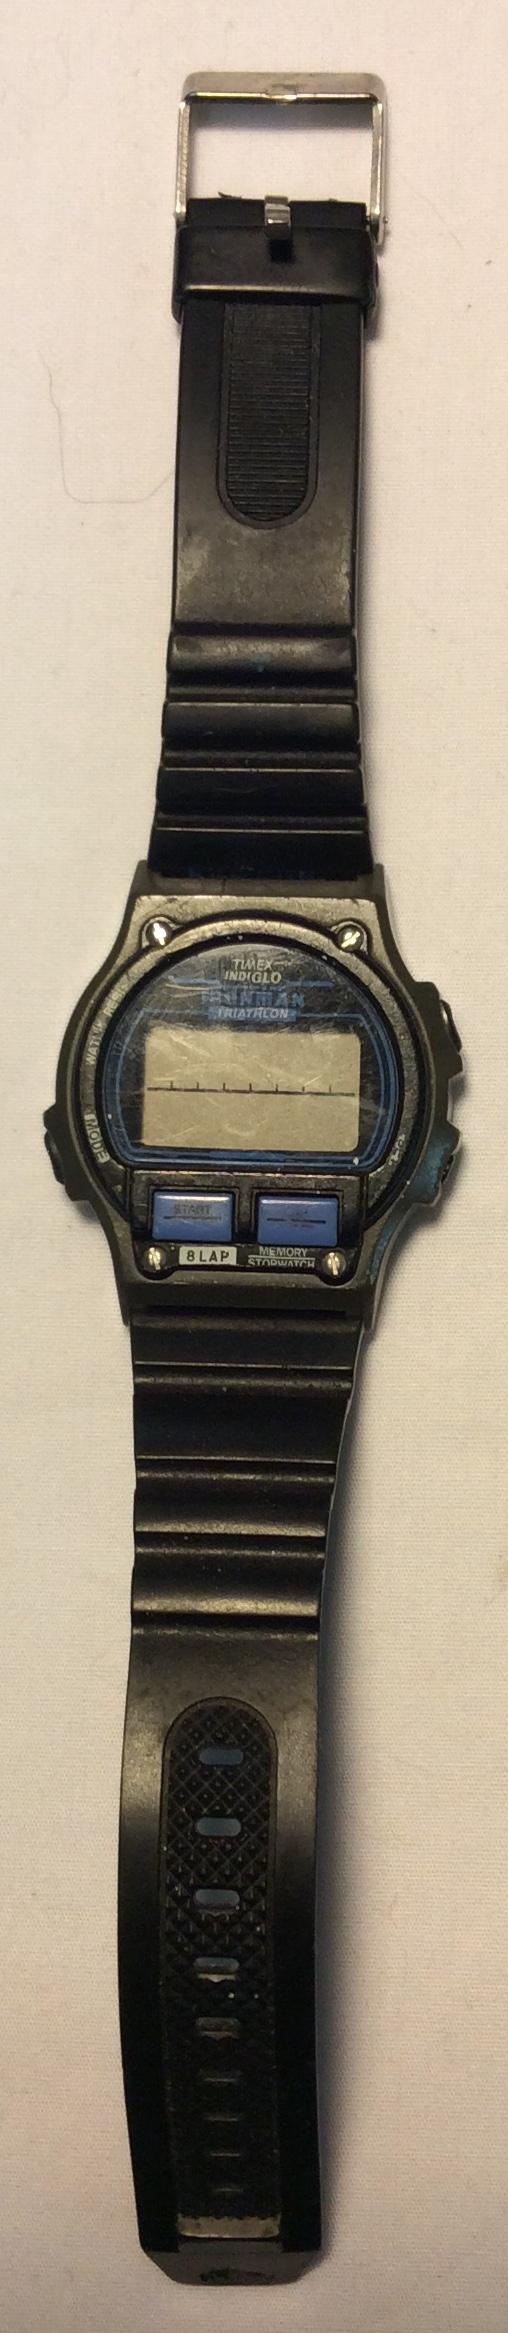 TImex Ironman watch - Digital face